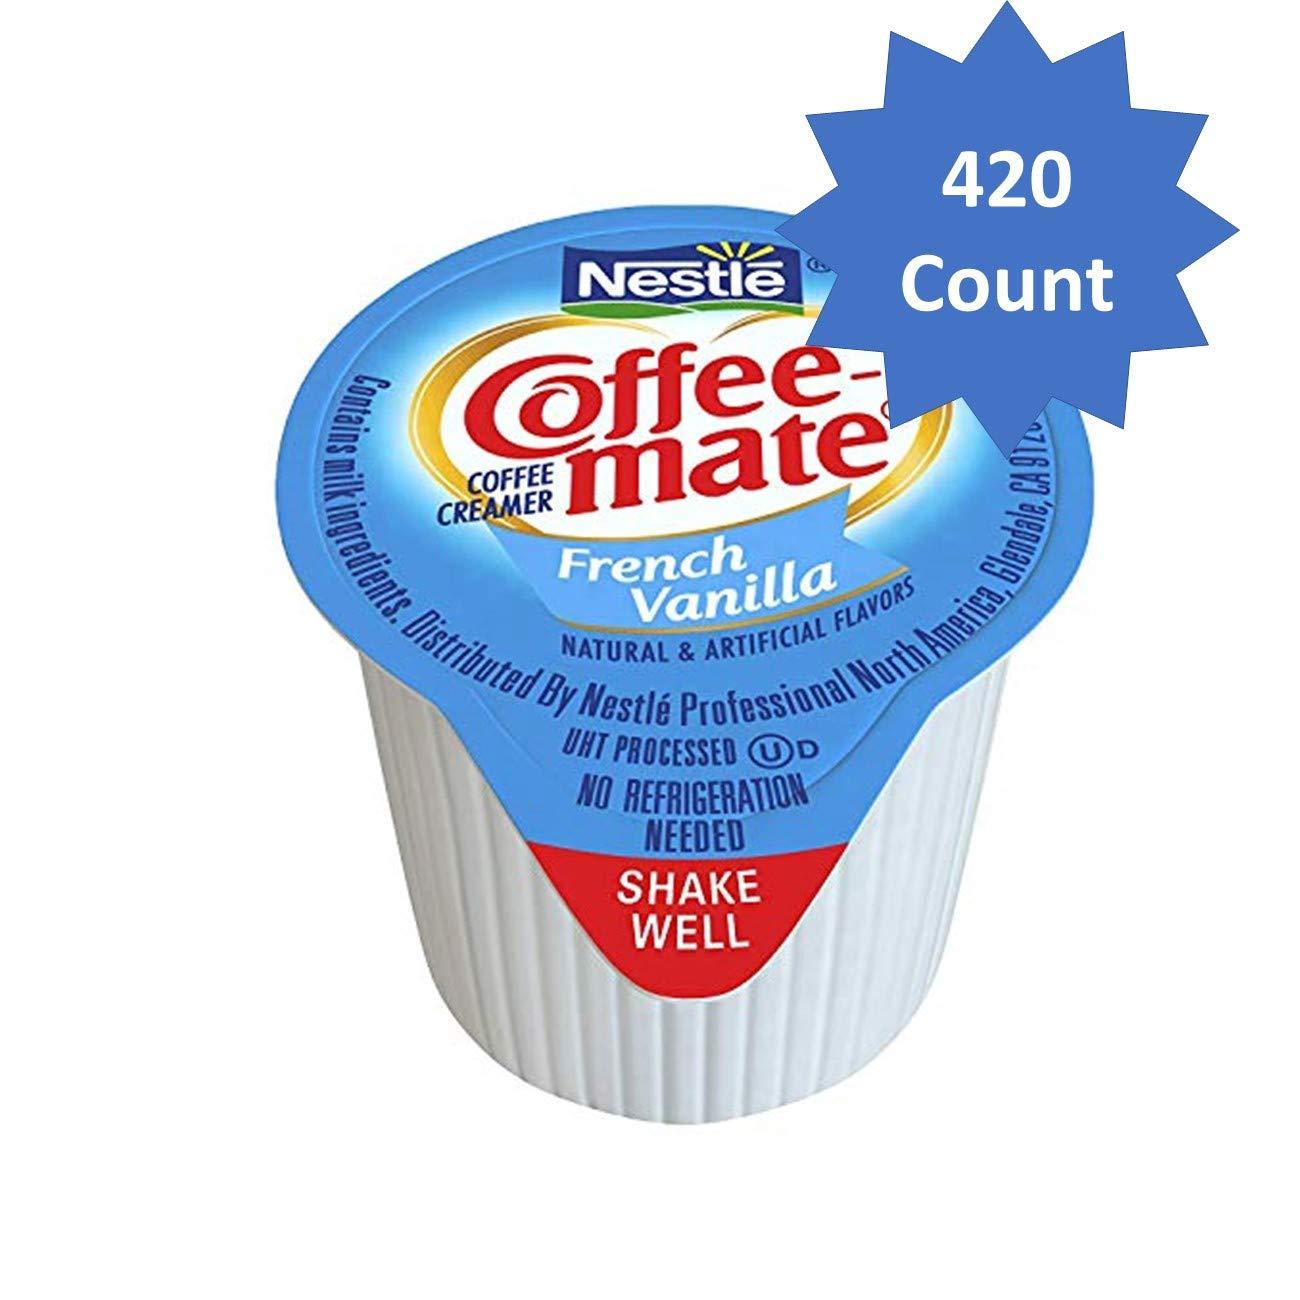 Nestle Coffee-mate Coffee Creamer, French Vanilla, liquid creamer singles, Pack of 420 (French Vanilla, Pack of 420) by Nestle Coffee Mate